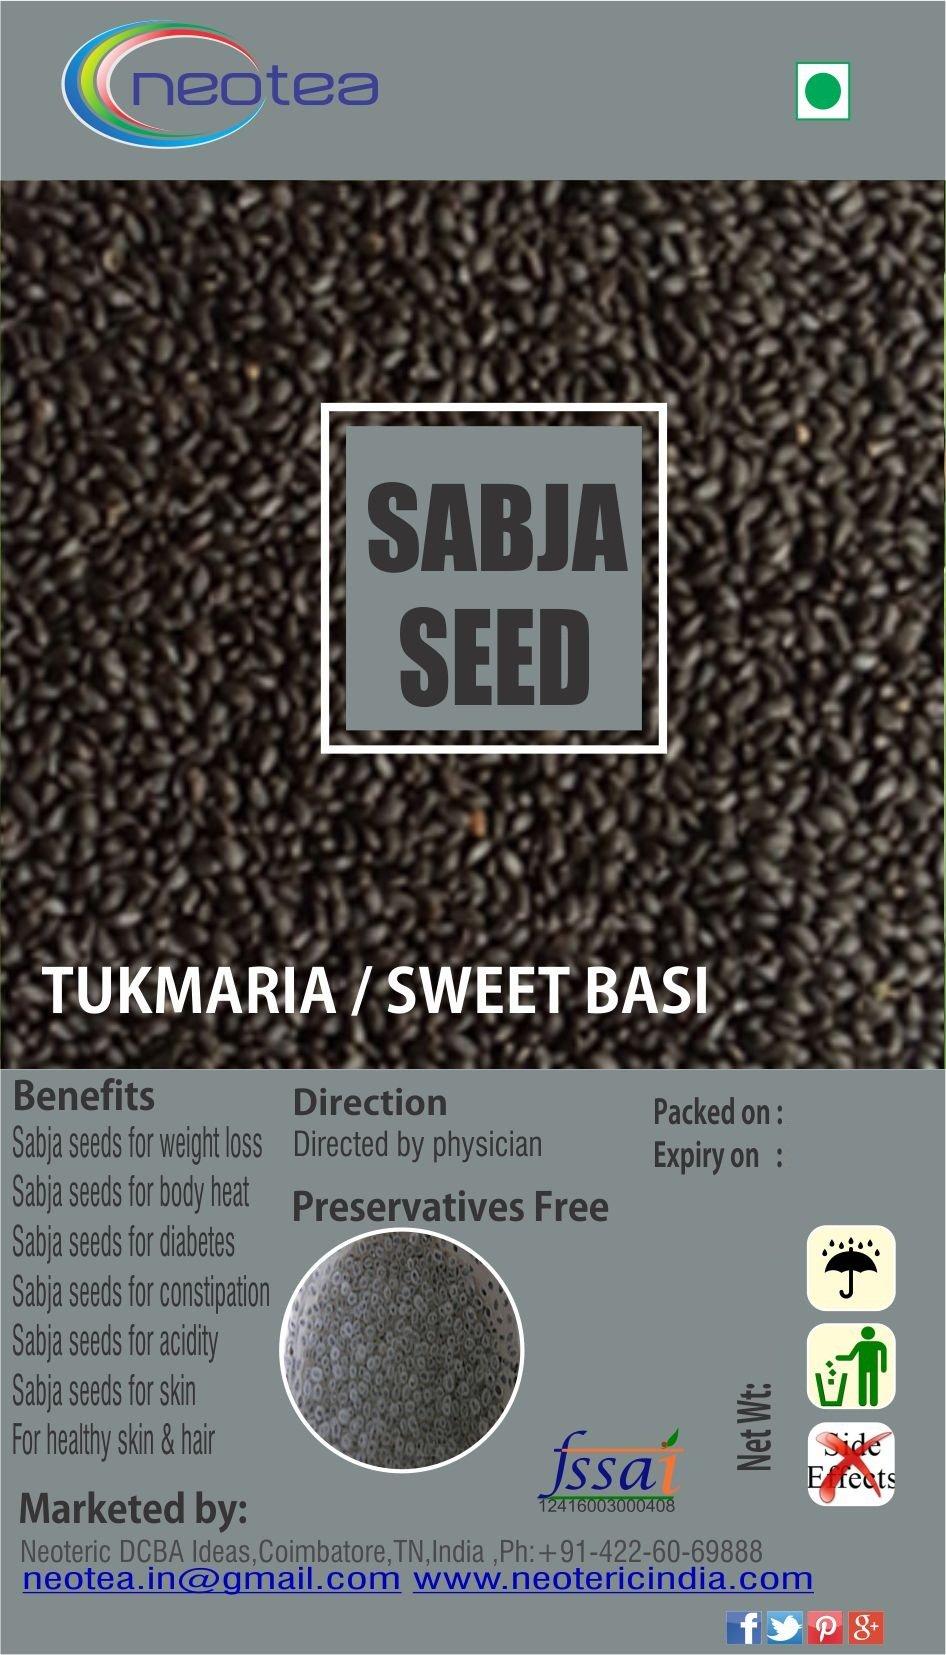 Neotea Basil Seeds | Tukmariya | Sabja Seeds, 300g by Neotea (Image #1)